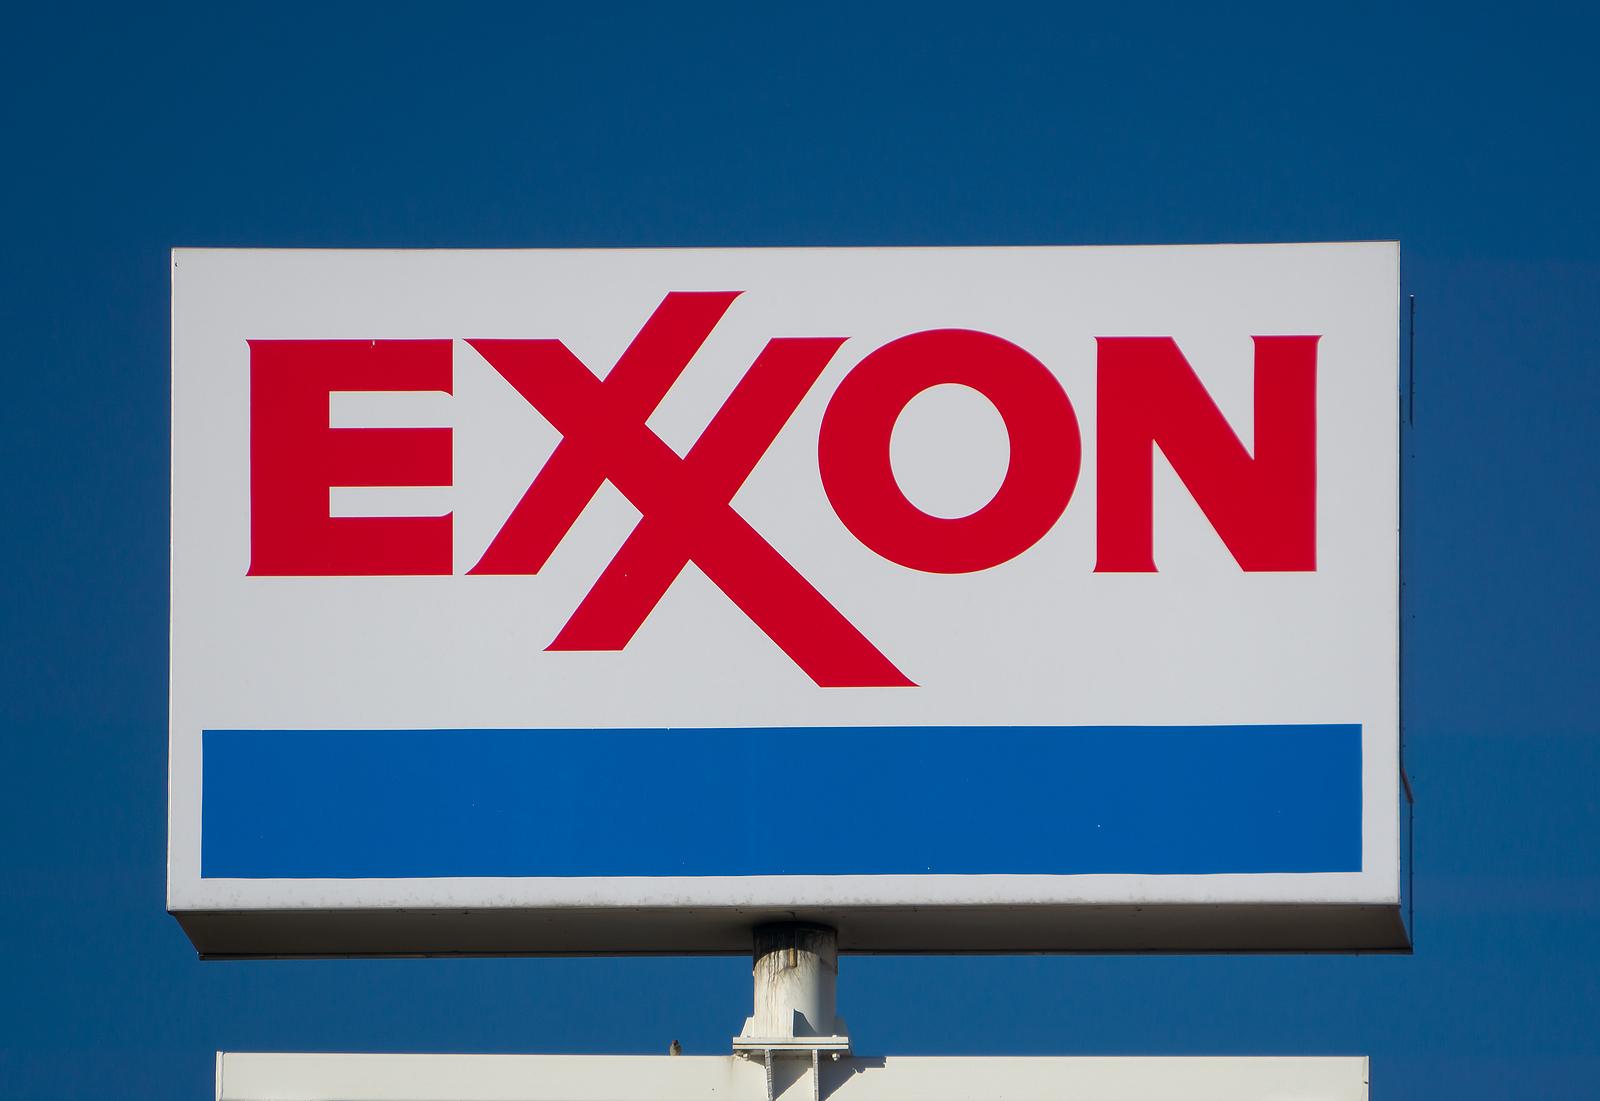 ExxonMobil XOM stock